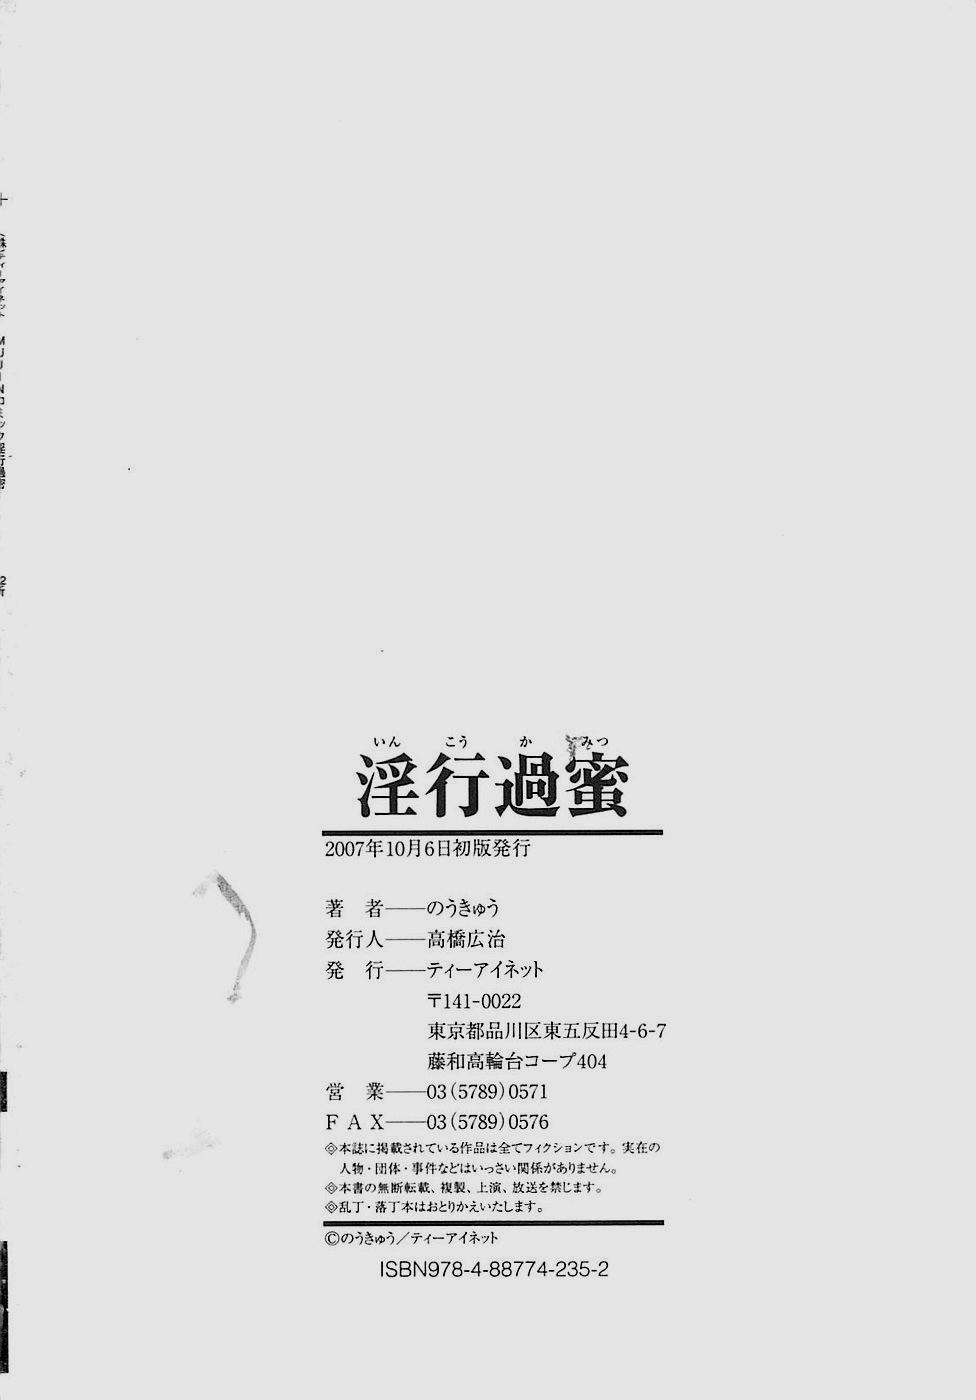 Inkoukamitsu 199